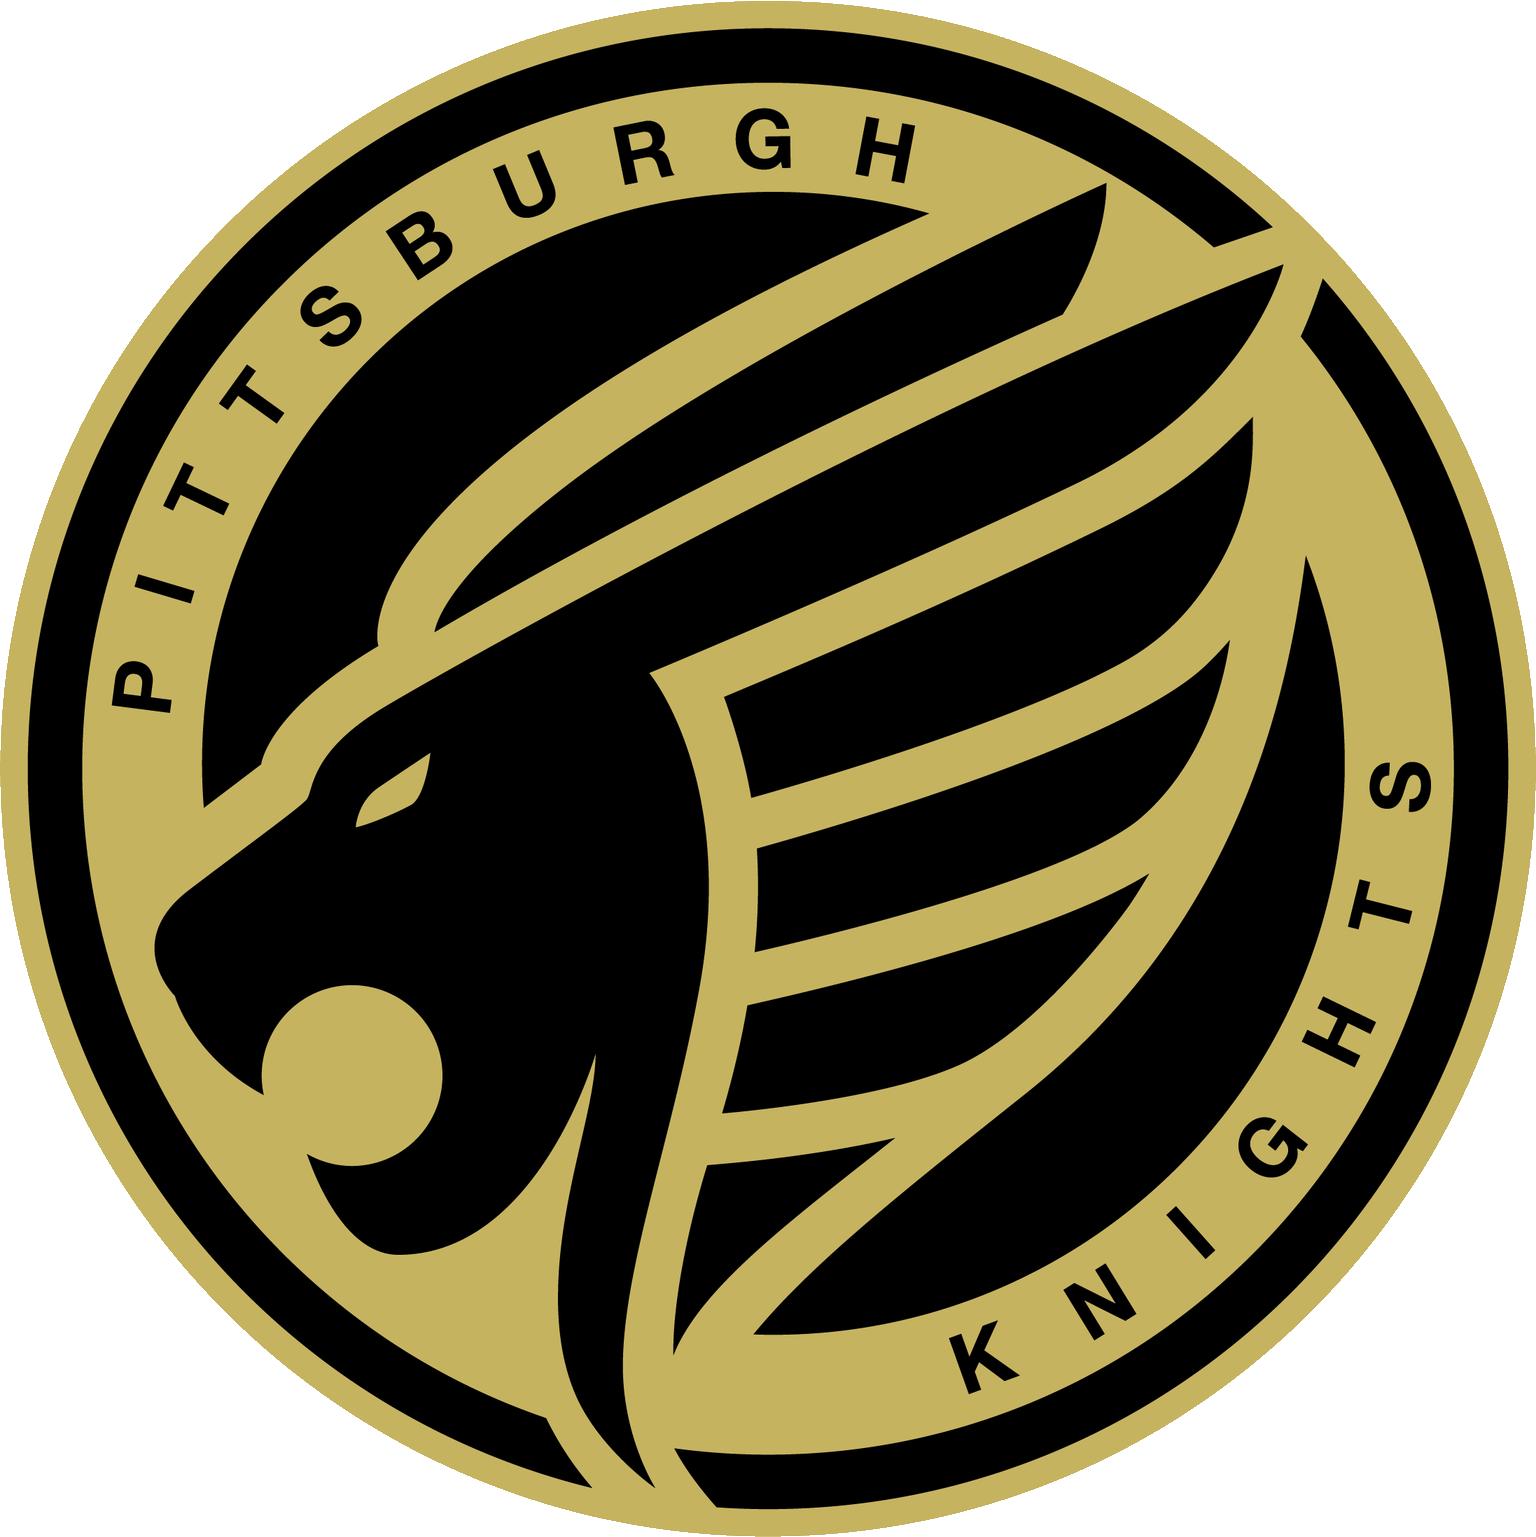 PittsburghKnightsLogo.png